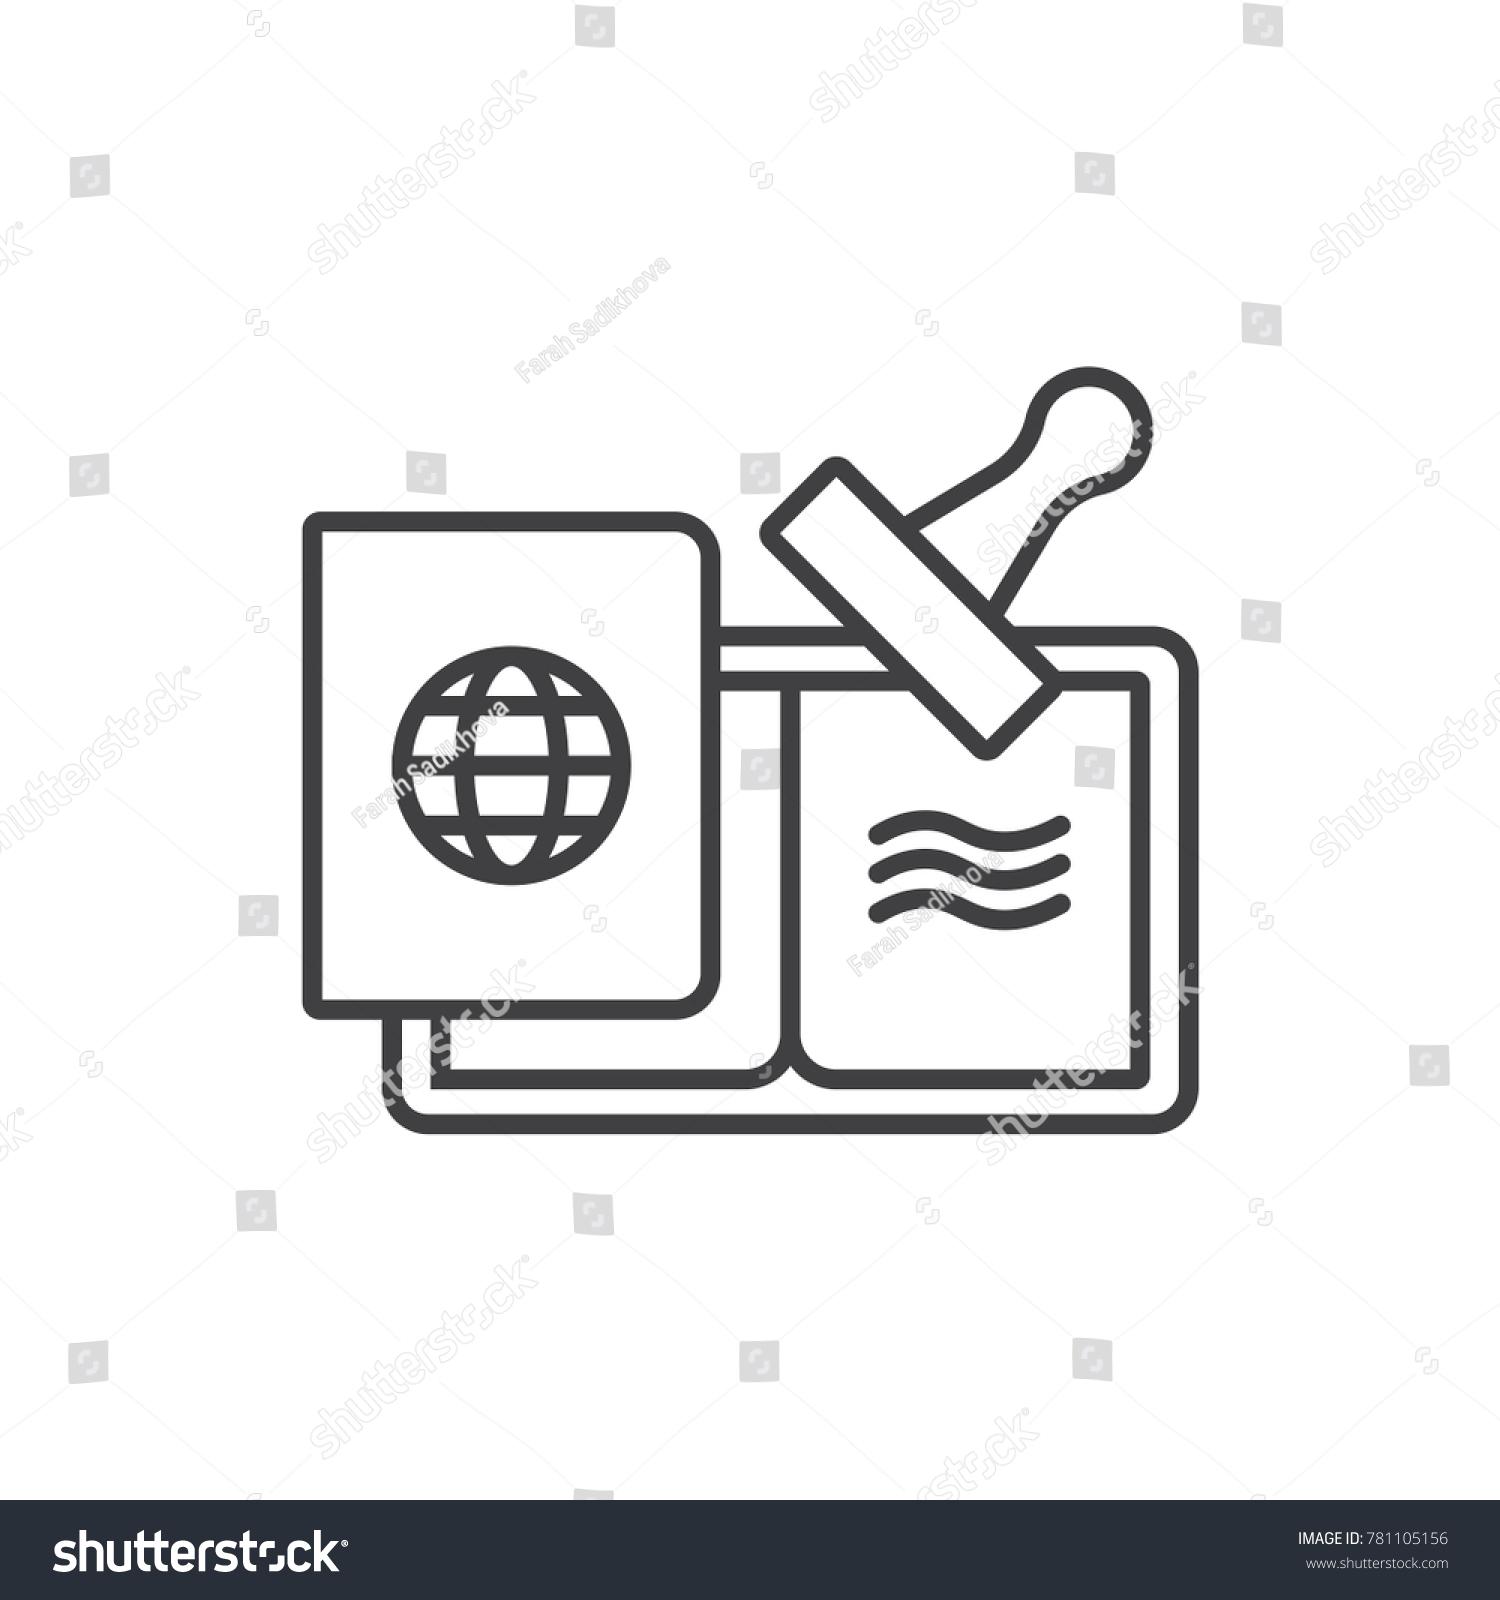 Passport visa stamp line icon stock vector 781105156 shutterstock passport with visa stamp line icon biocorpaavc Choice Image